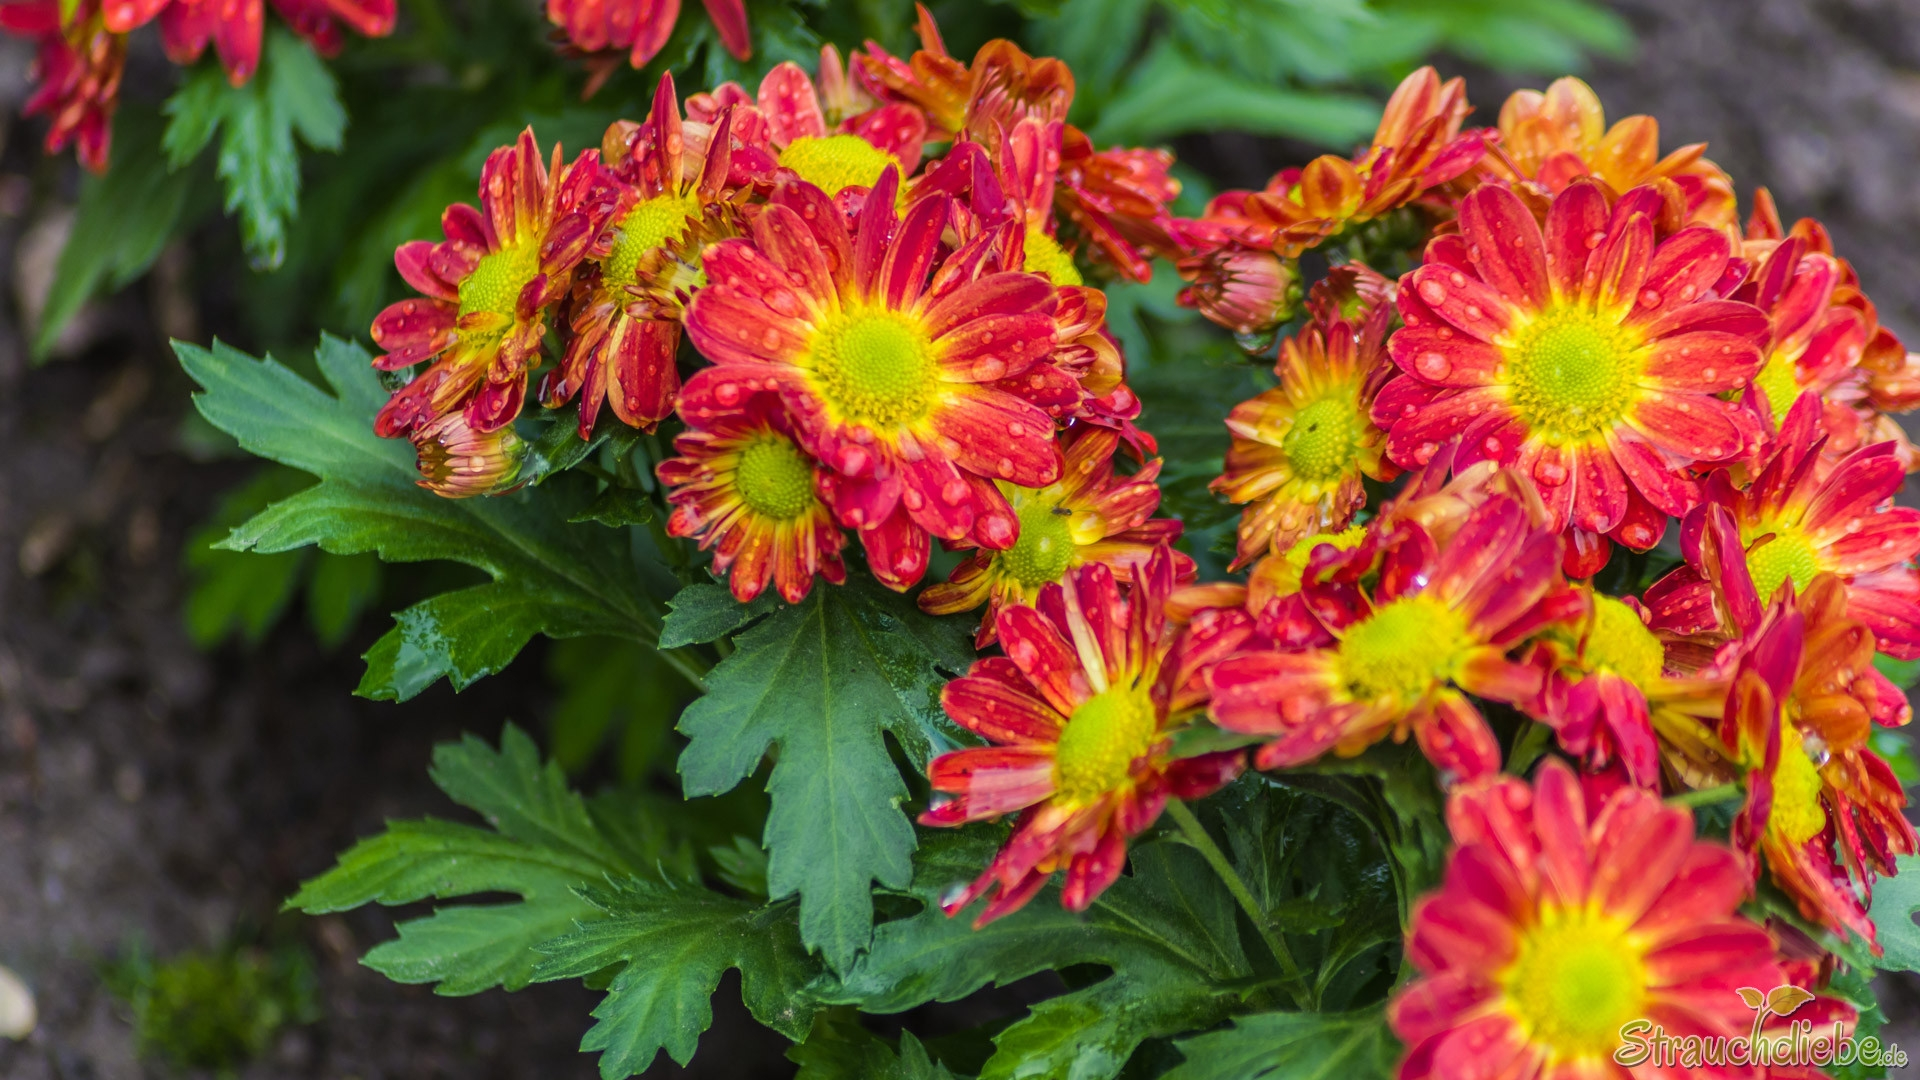 Garten-Chrysantheme (Chrysanthemum x hortorum)